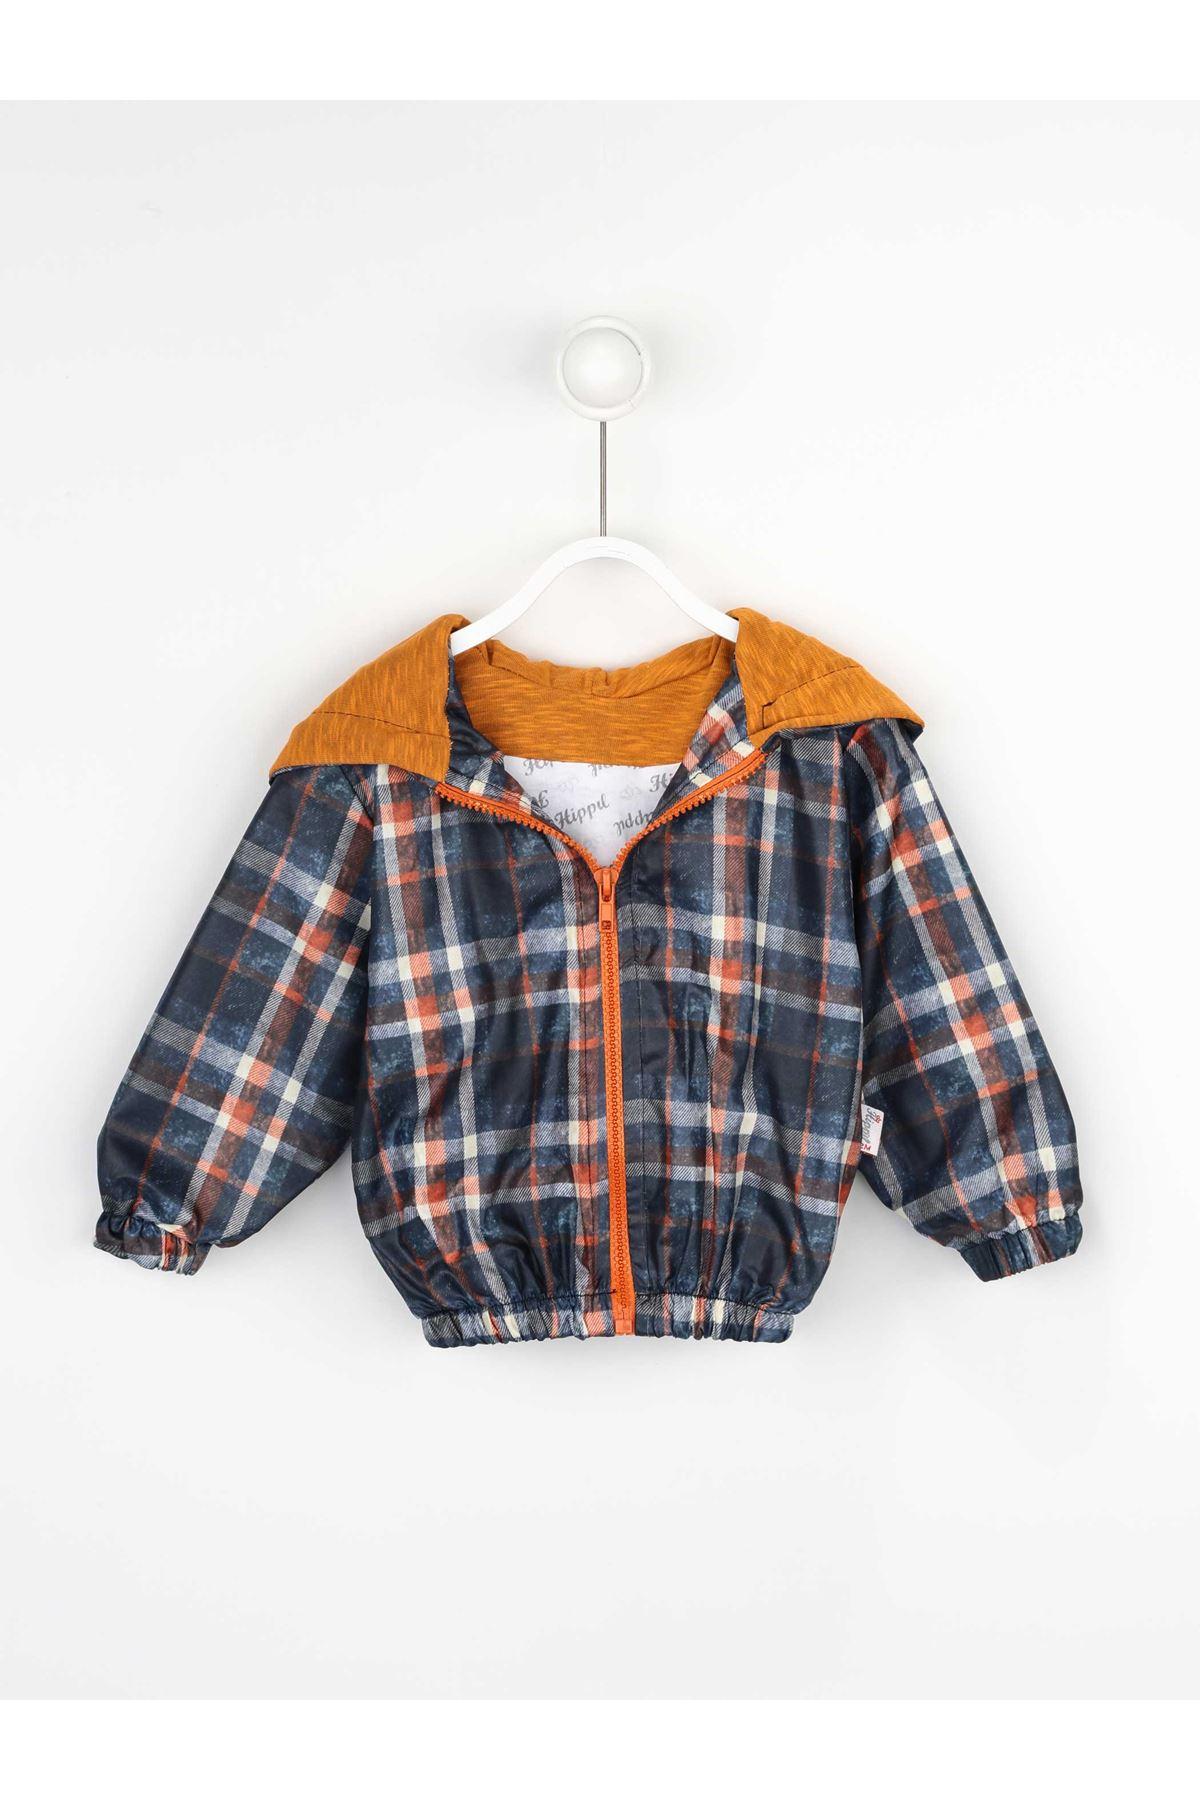 Orange Boys Children's Hooded Raincoat coats Seasonal Thin Waterproof Men Jacket Winter Rain Kids coats